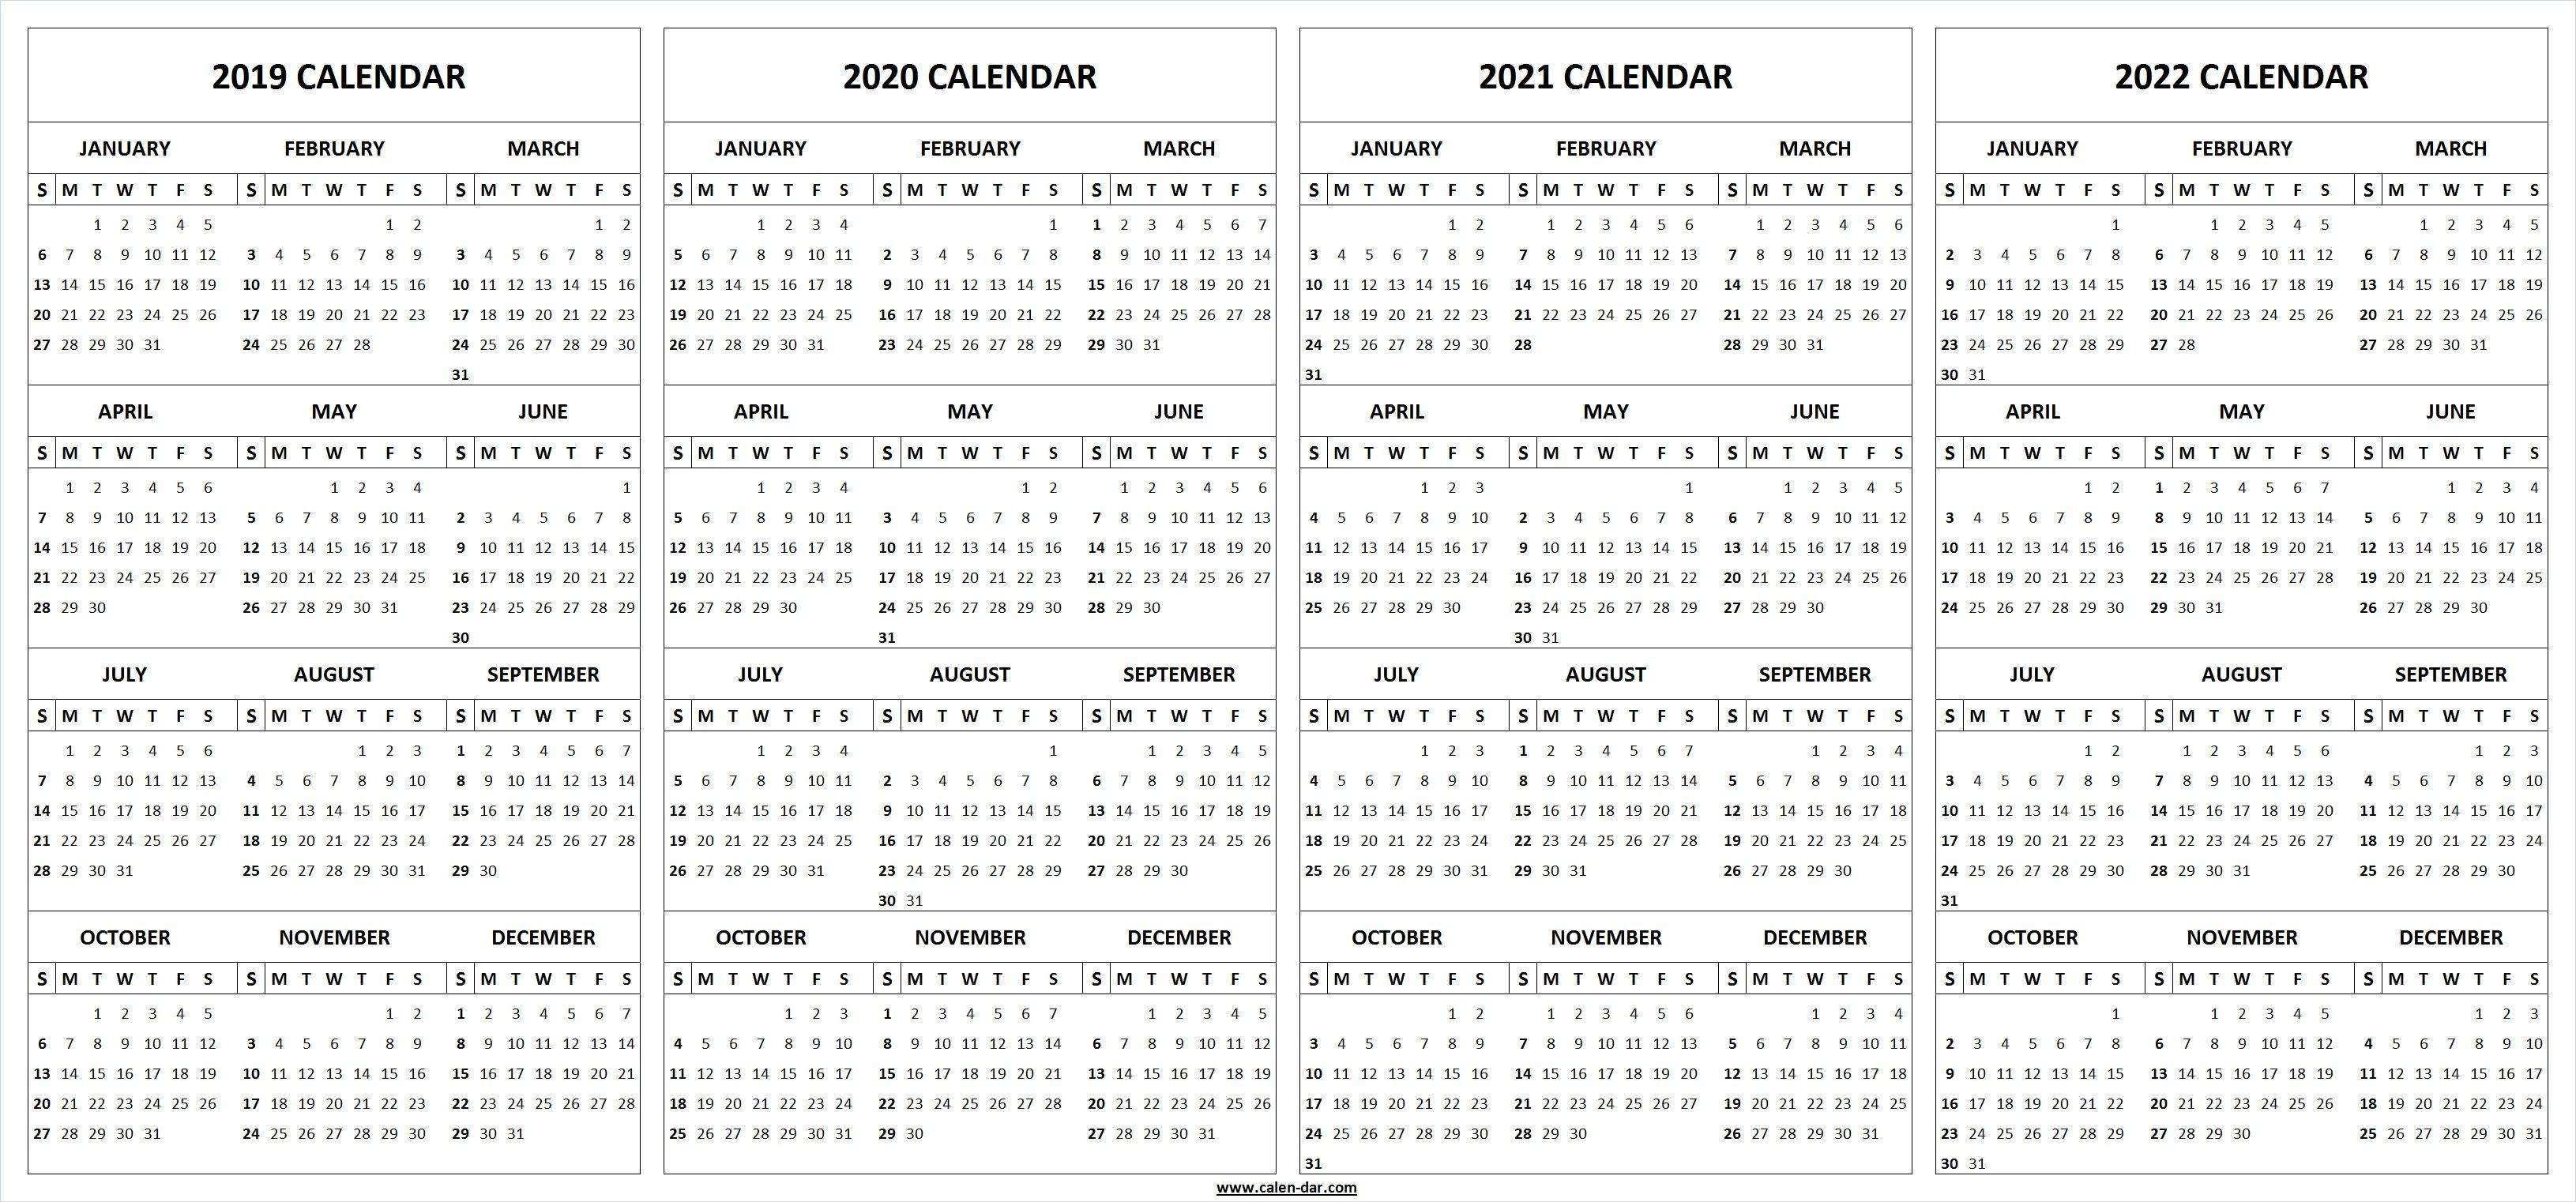 2019 2020 2021 2022 Calendar Blank Template | Calendar | 2021 within Downloadable 2019-2020 Calendar In Word